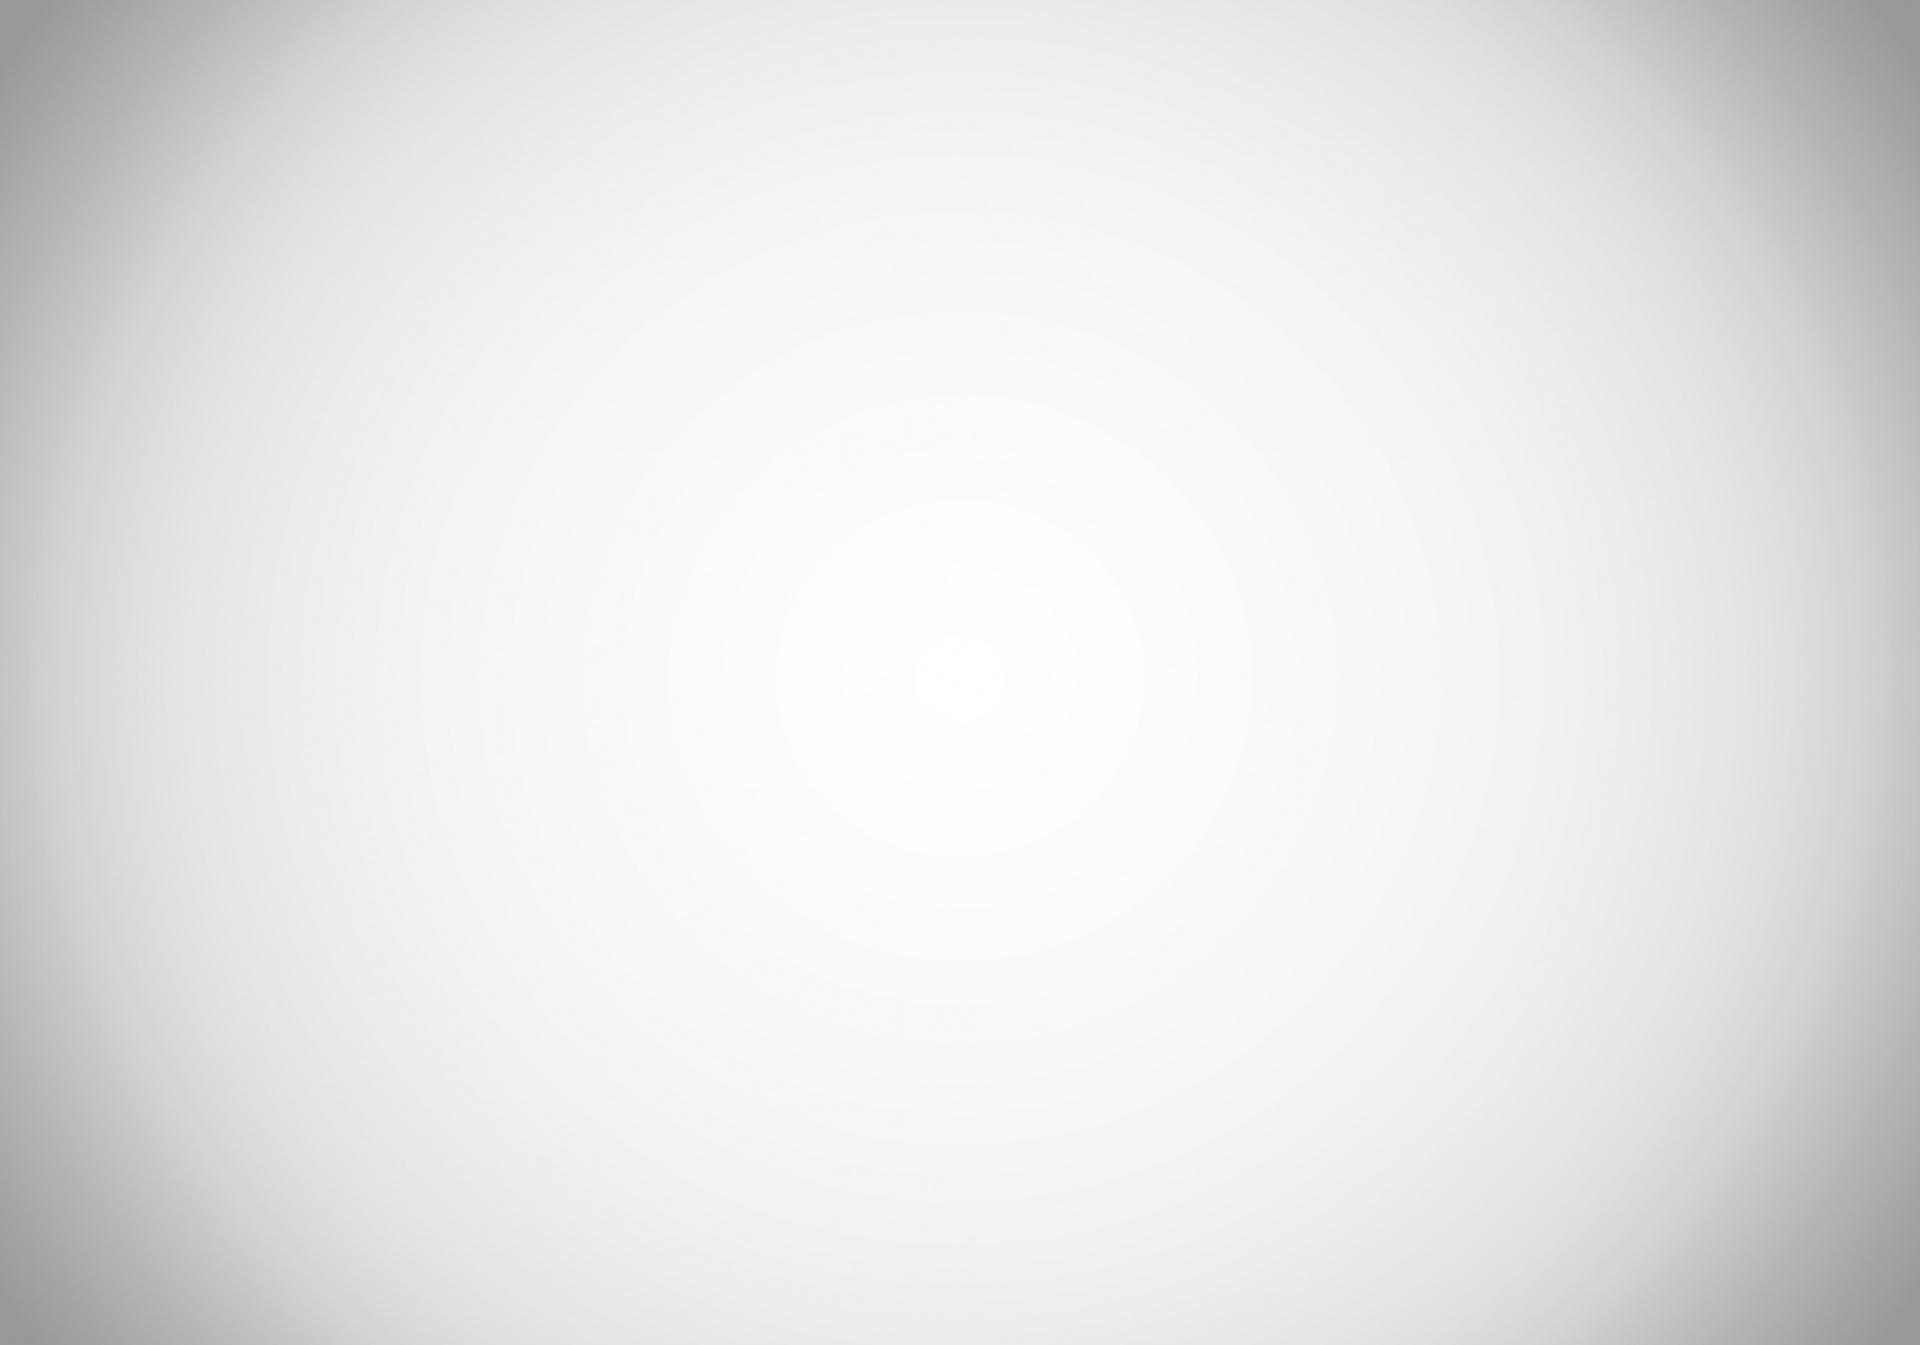 Grey White Background Free Stock Photo  Public Domain